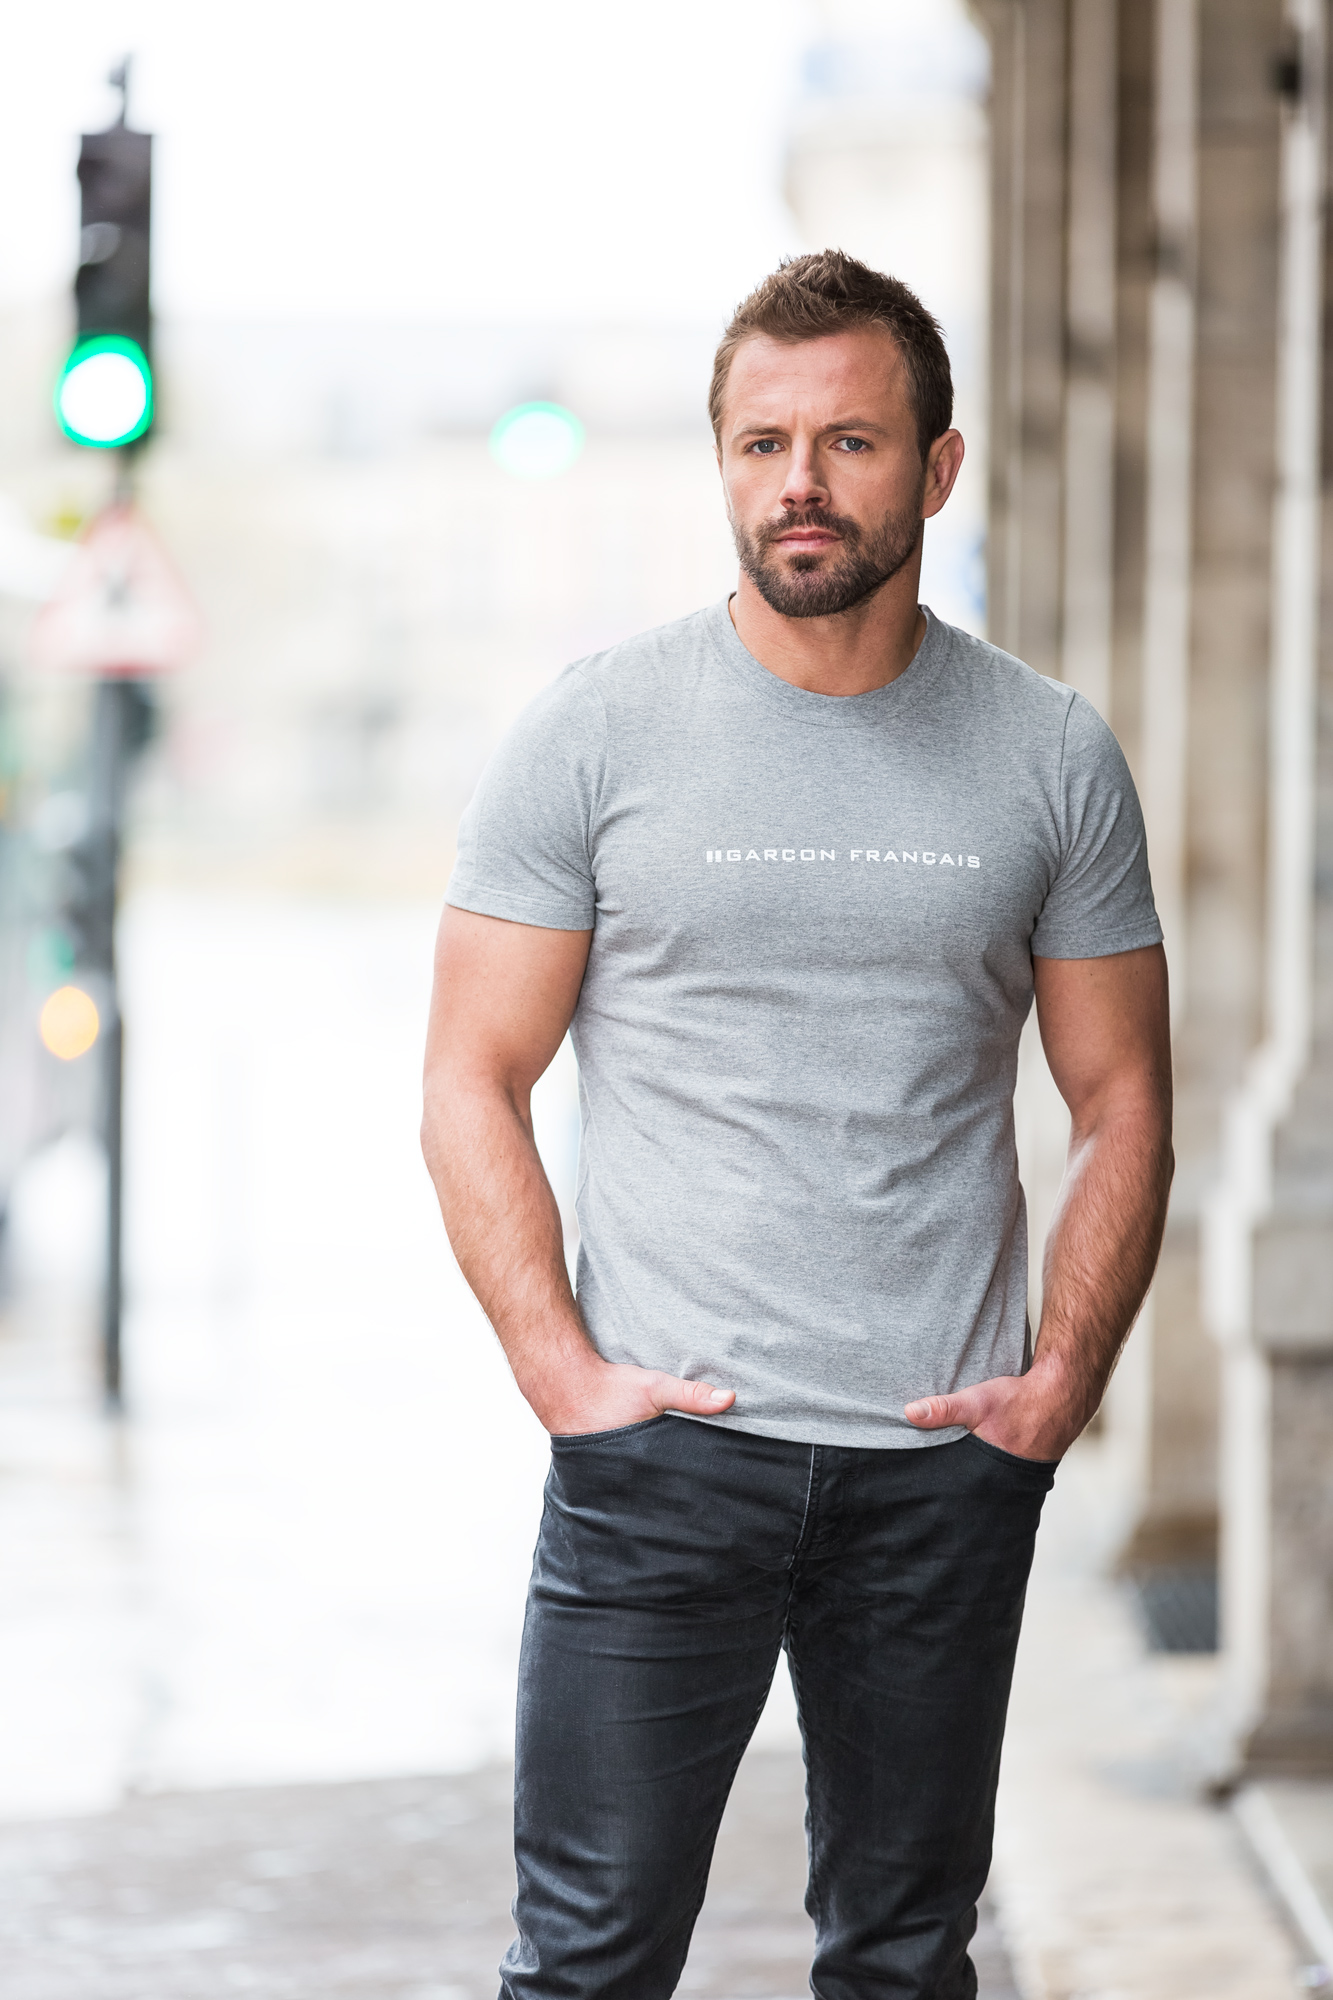 tshirts garçon français